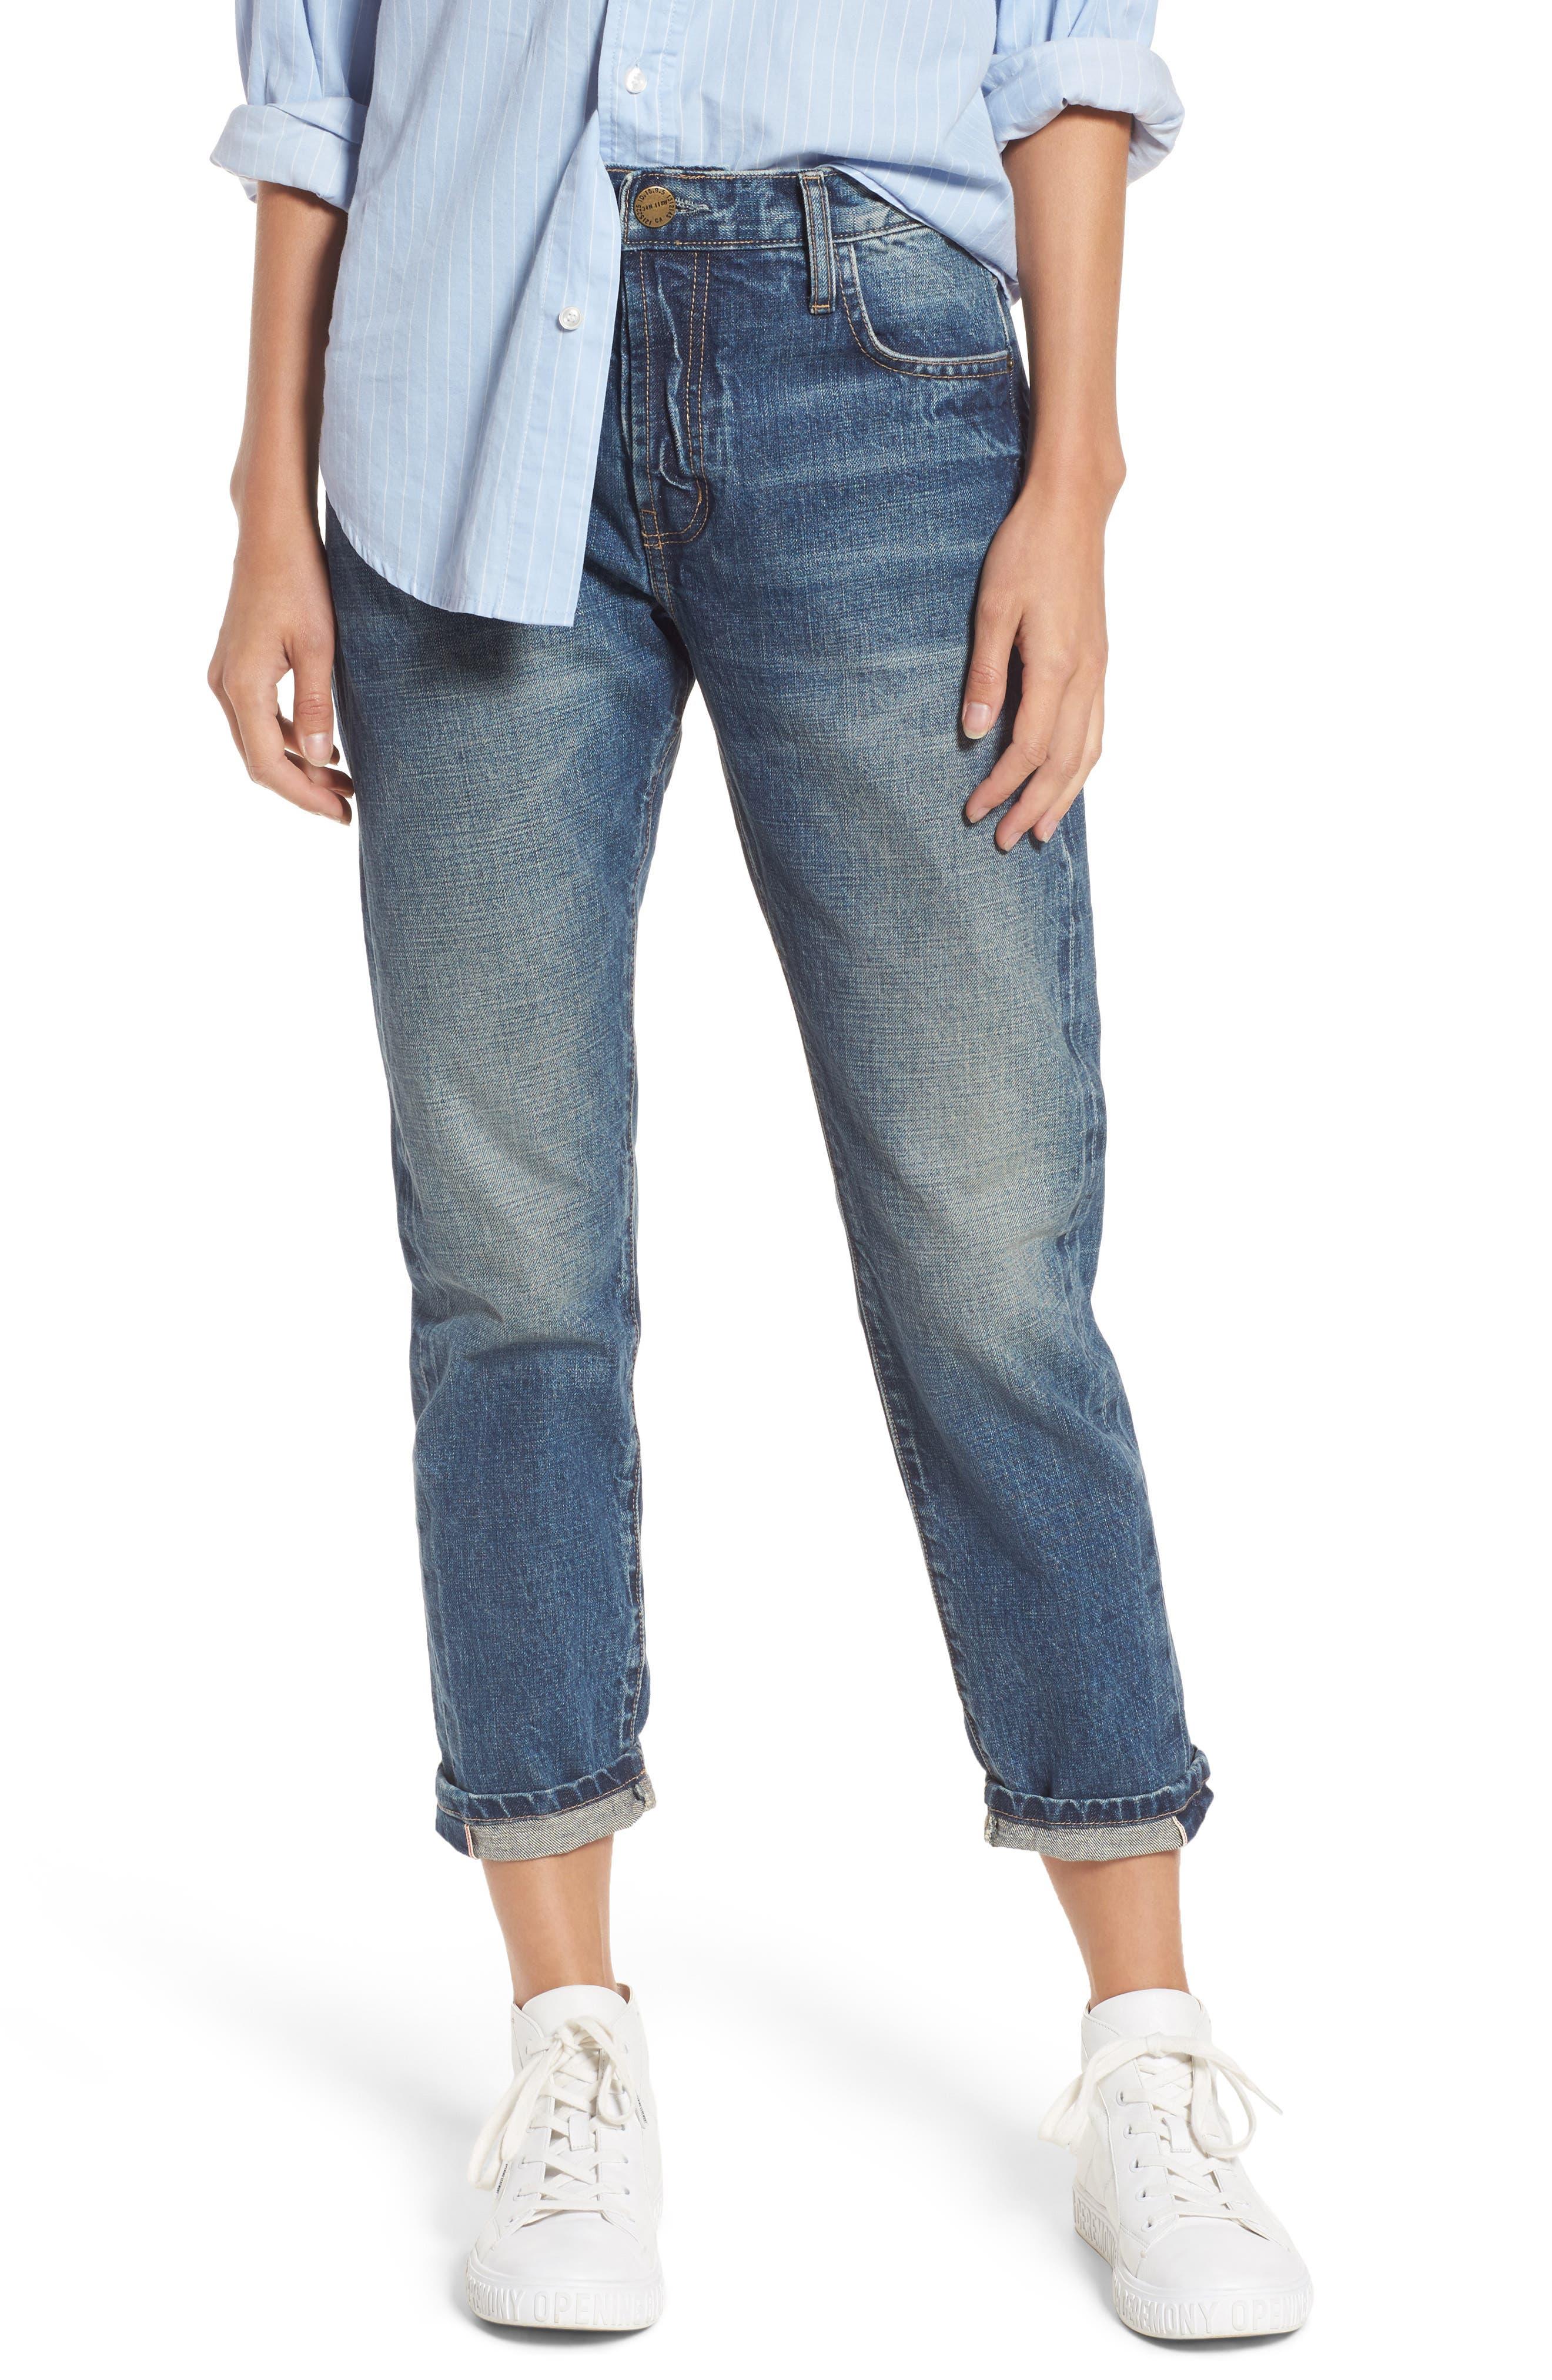 Main Image - Current/Elliott The Selvedge High Waist Crop Jeans (Hemet)